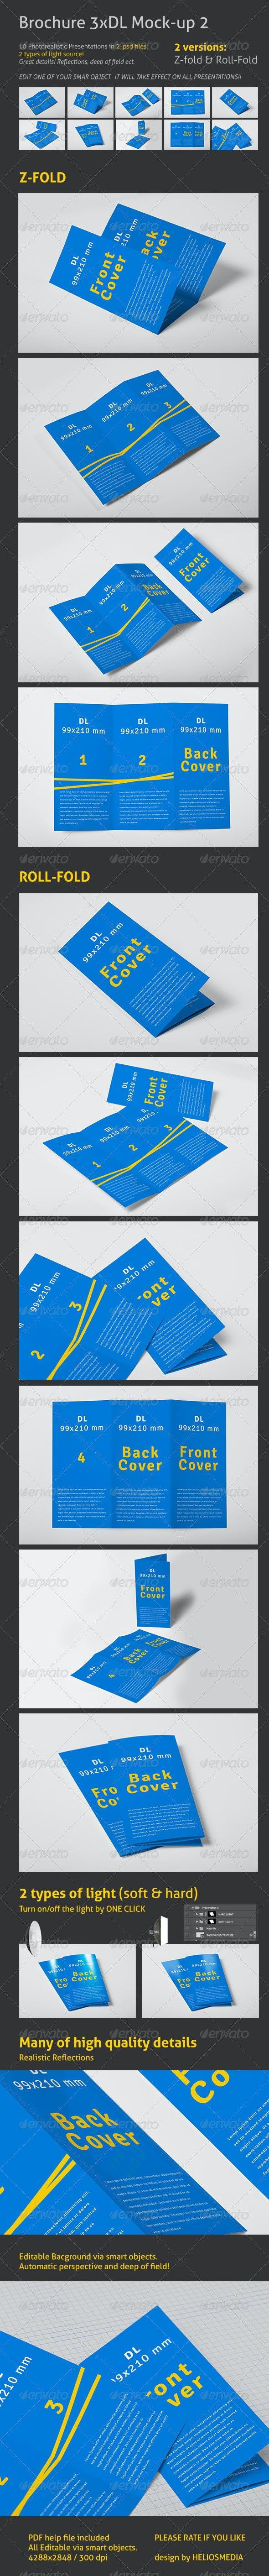 Brochure 3xDL Mock-up 2 - Brochures Print